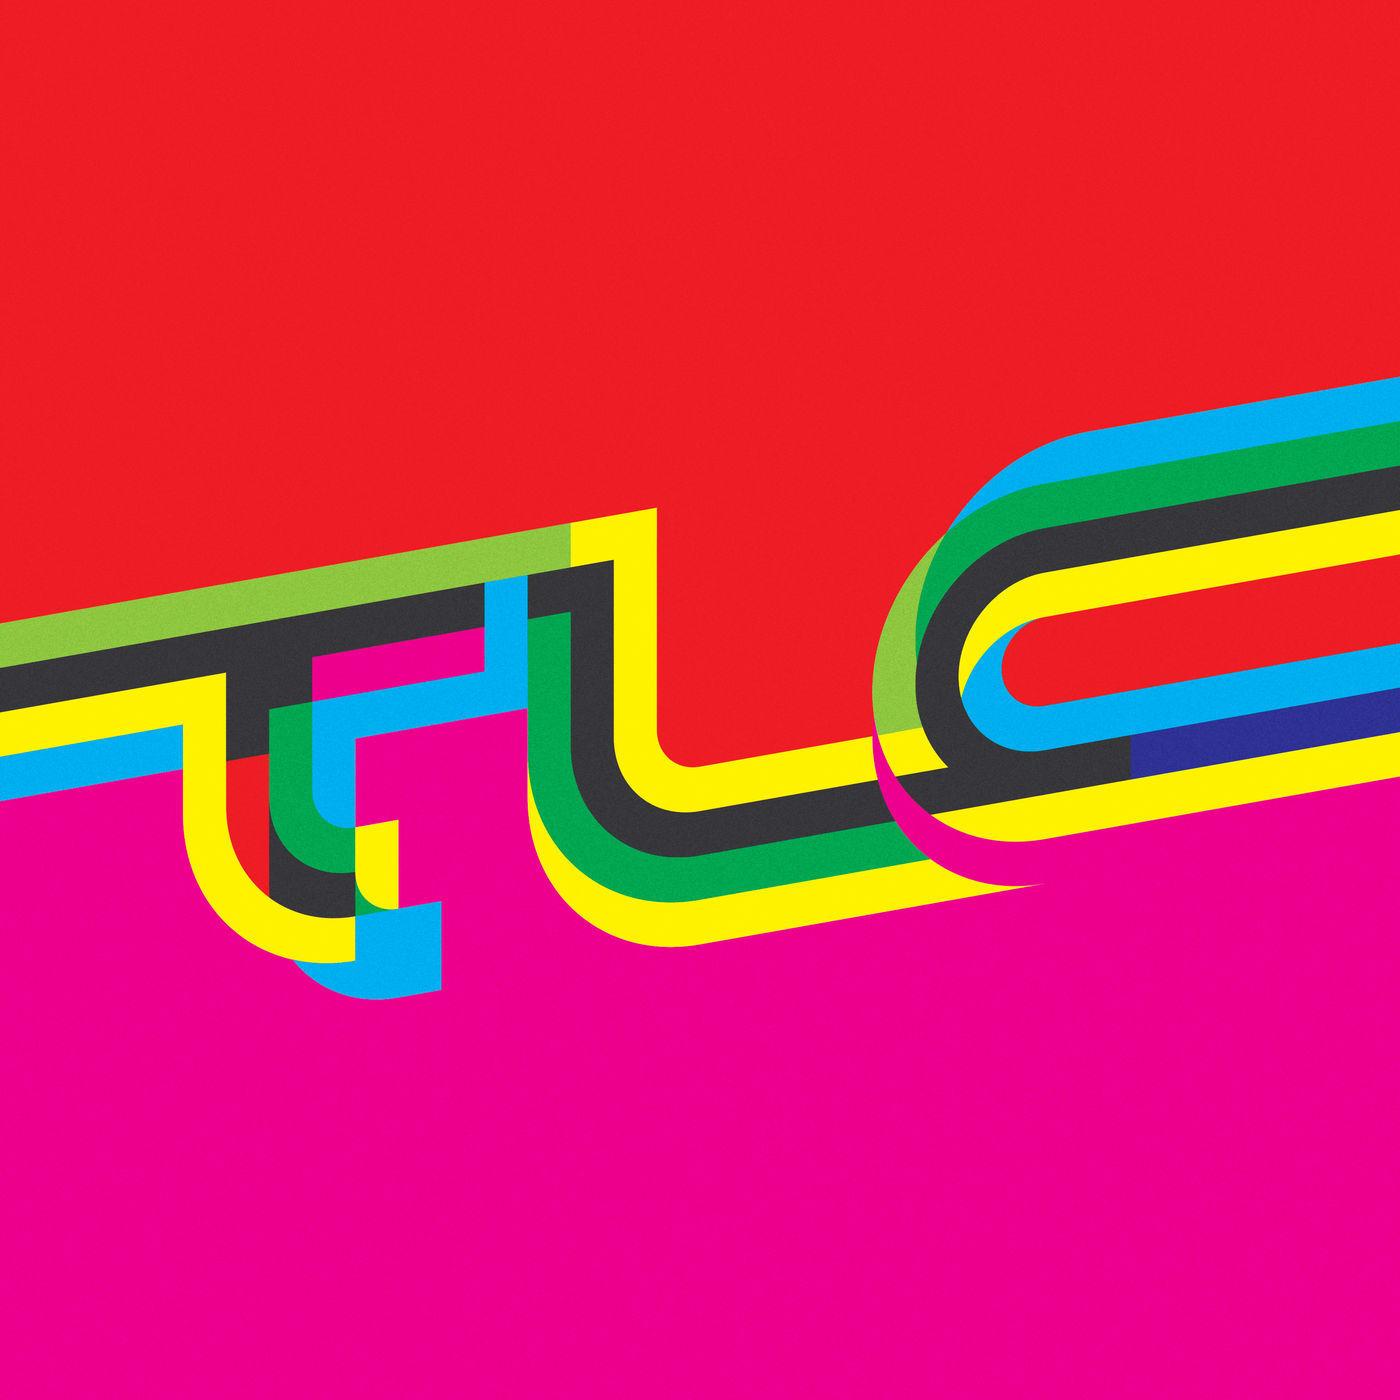 tlc-cover